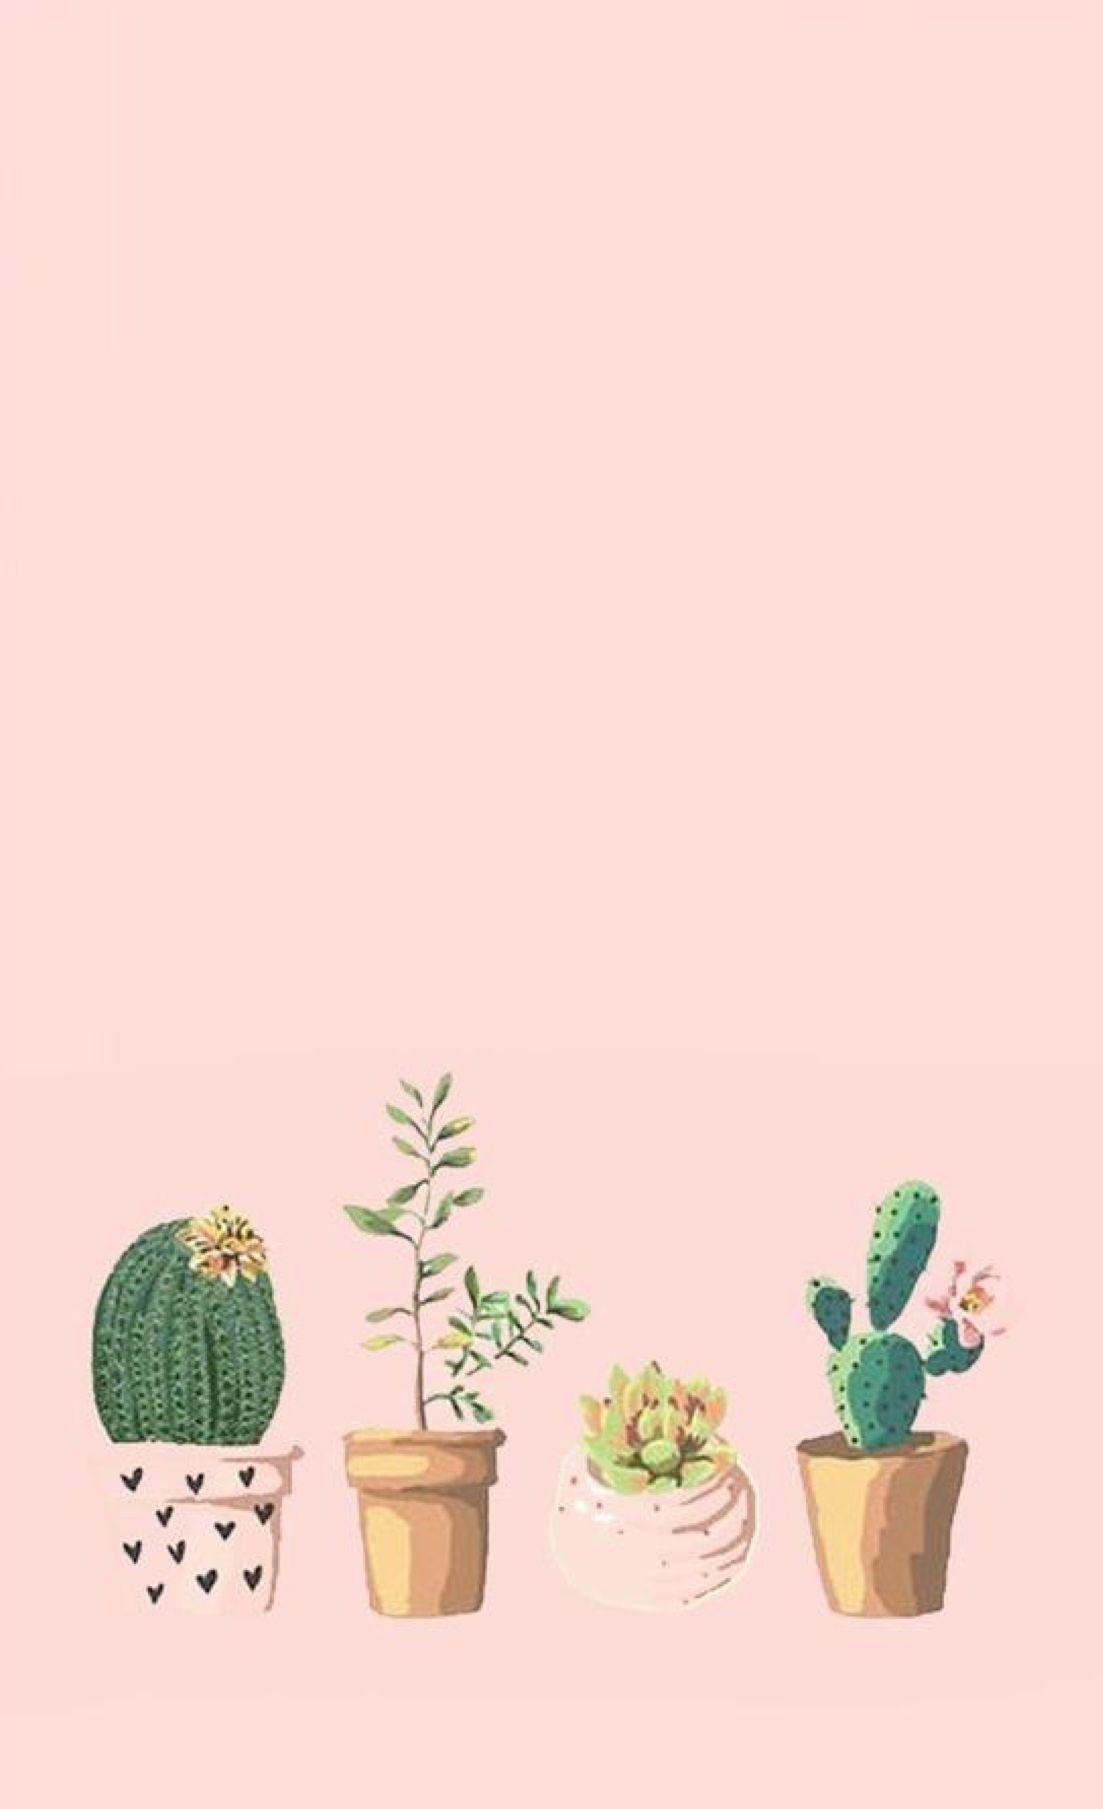 Pin By Trisalmadesti On Journal Pastel Iphone Wallpaper